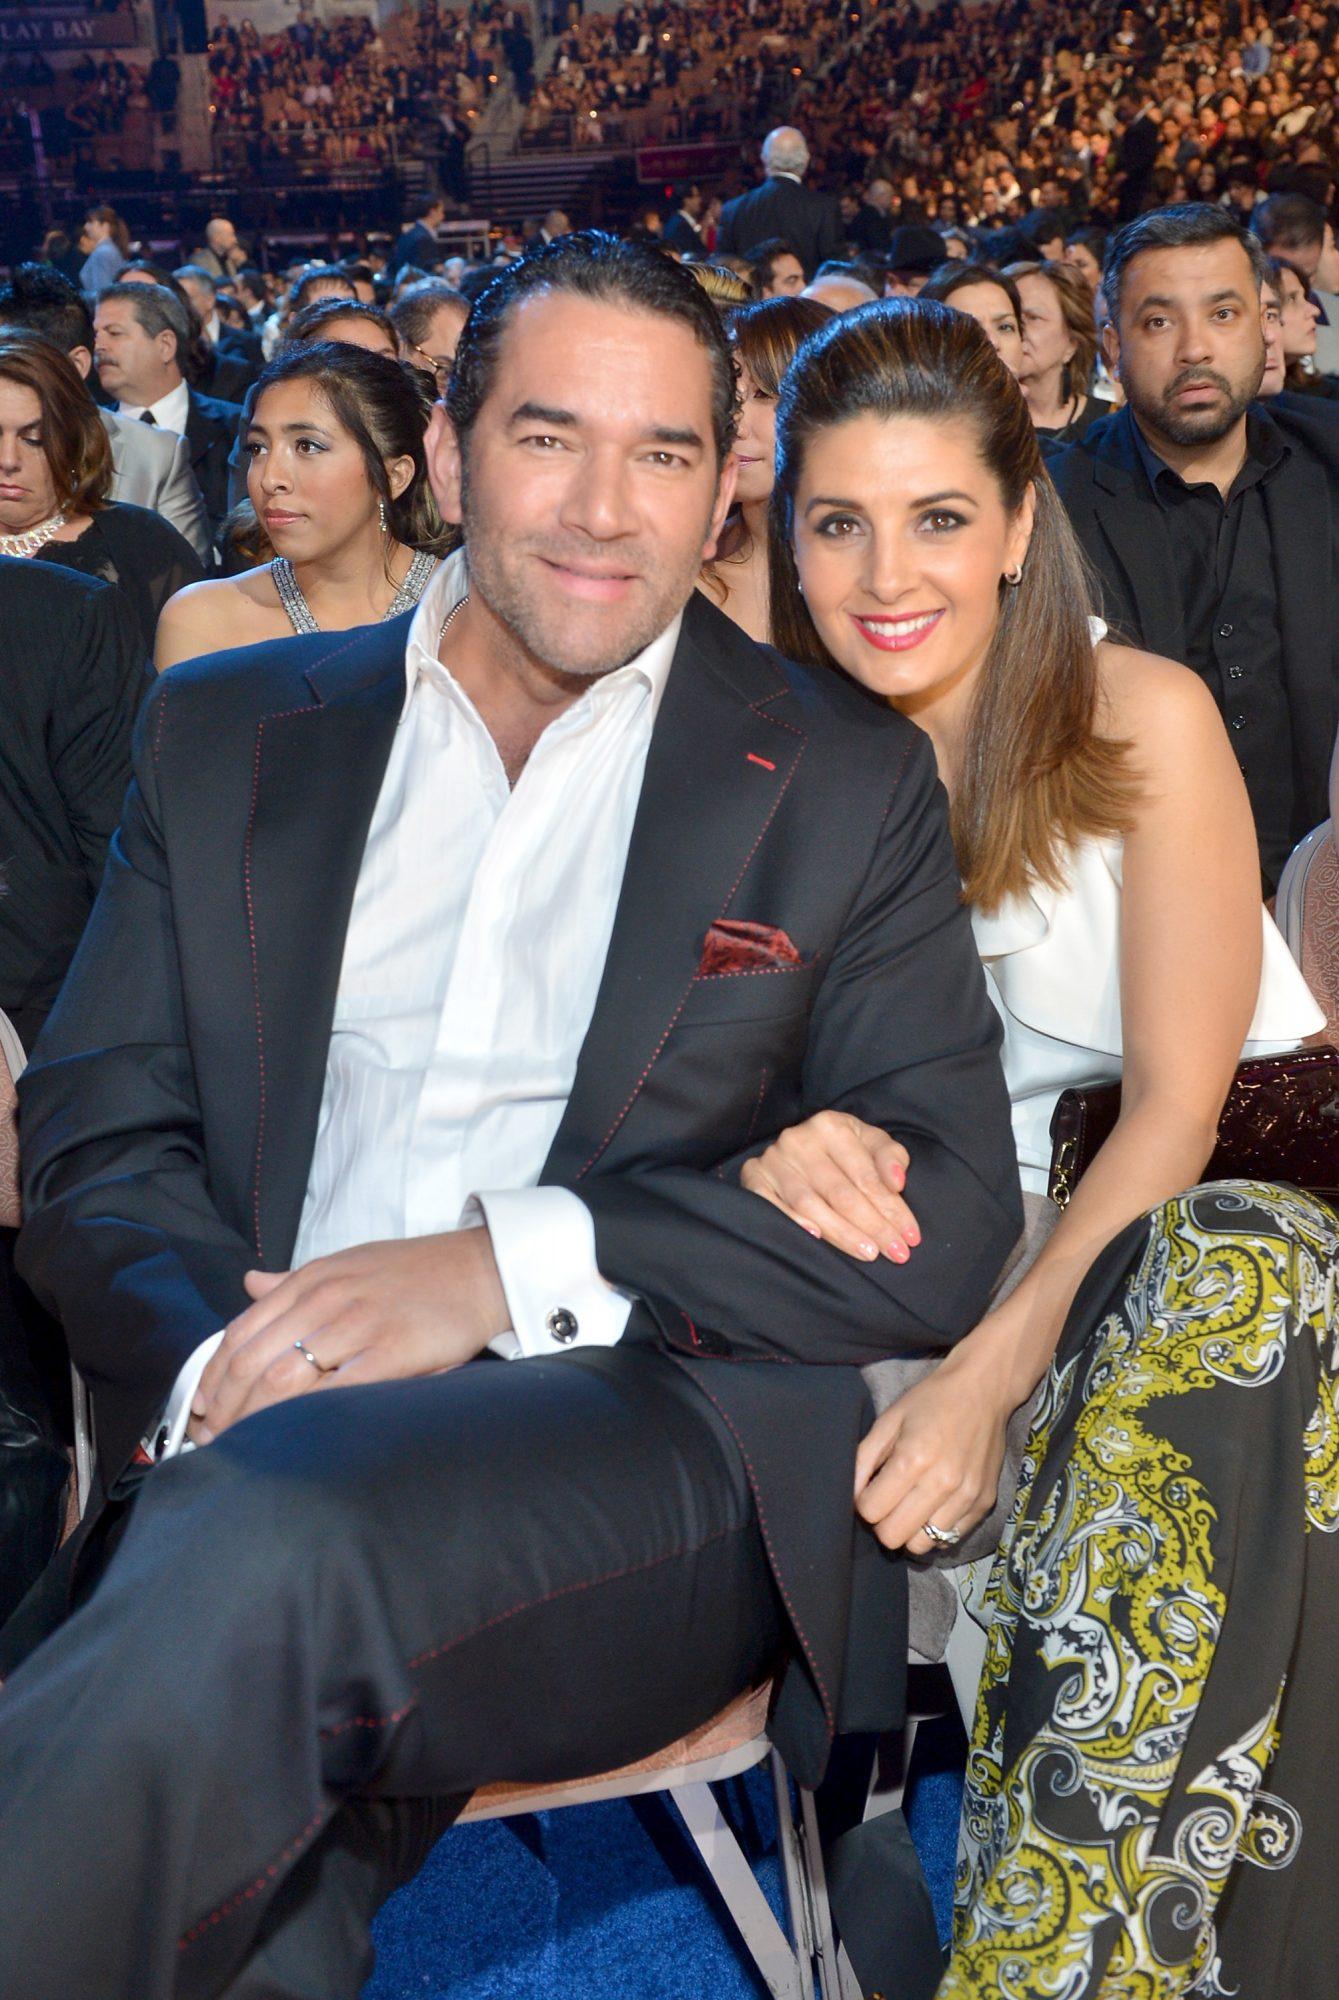 Eduardo Santamarina y Mayrín Villanueva